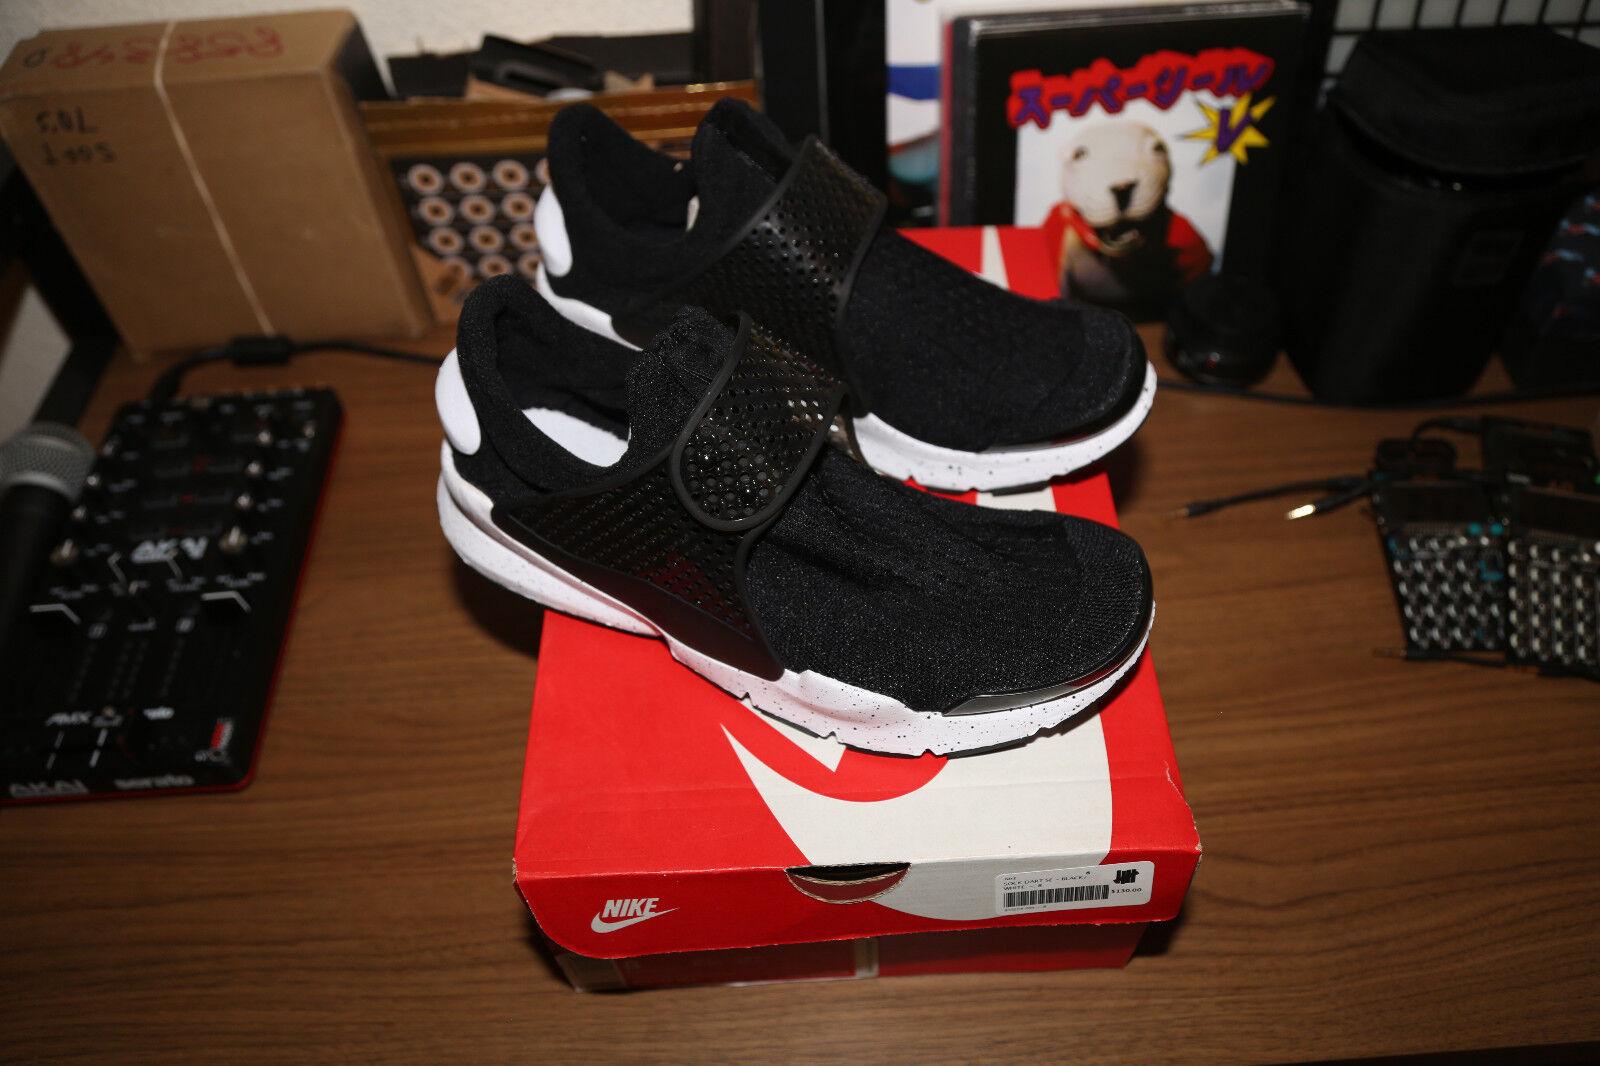 Nike Sock Dart 8 8.5 DS RARE presto, fragment, air max, undftd